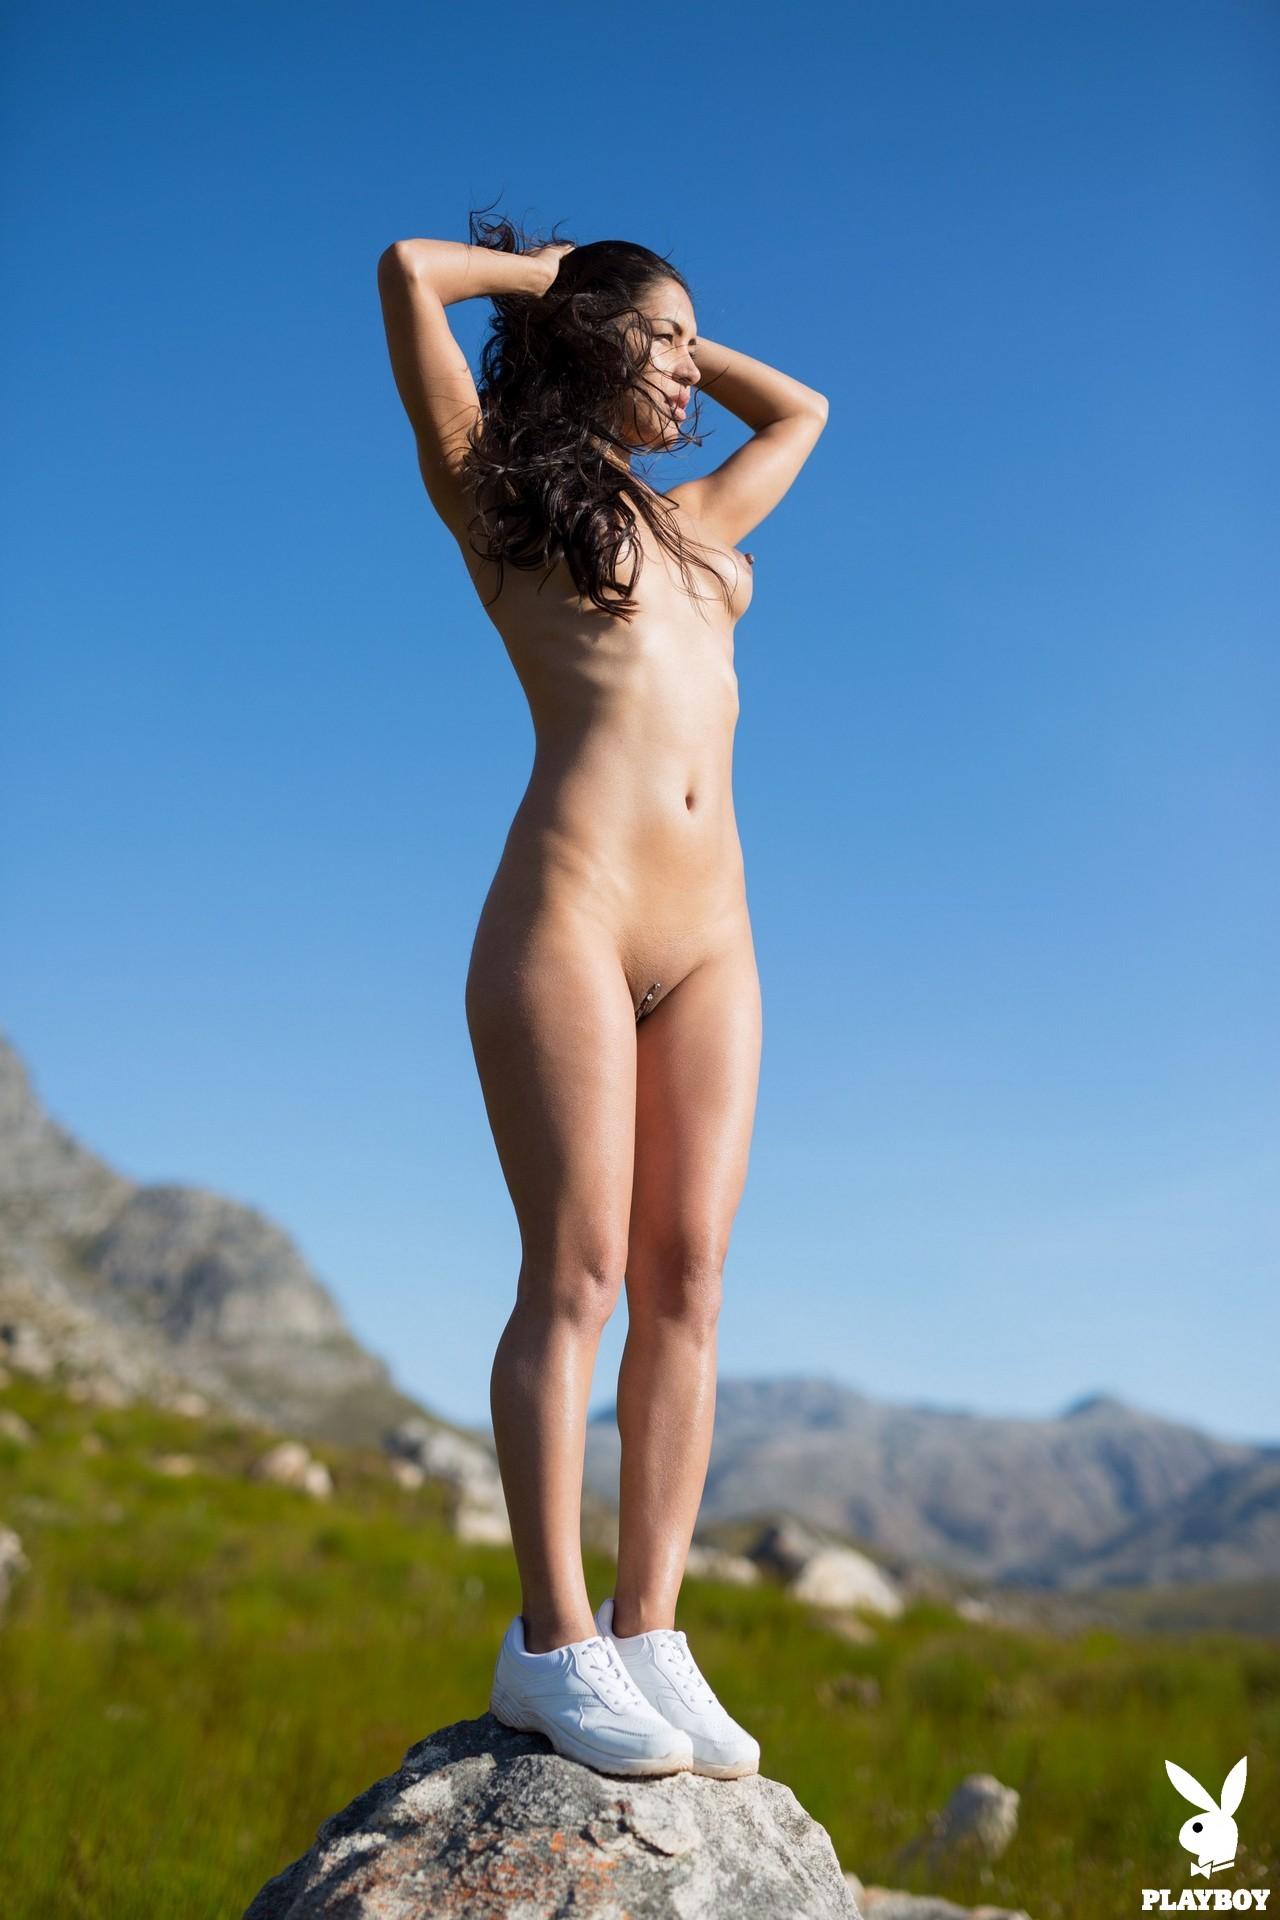 Chloe Rose in Trail Blazing 8